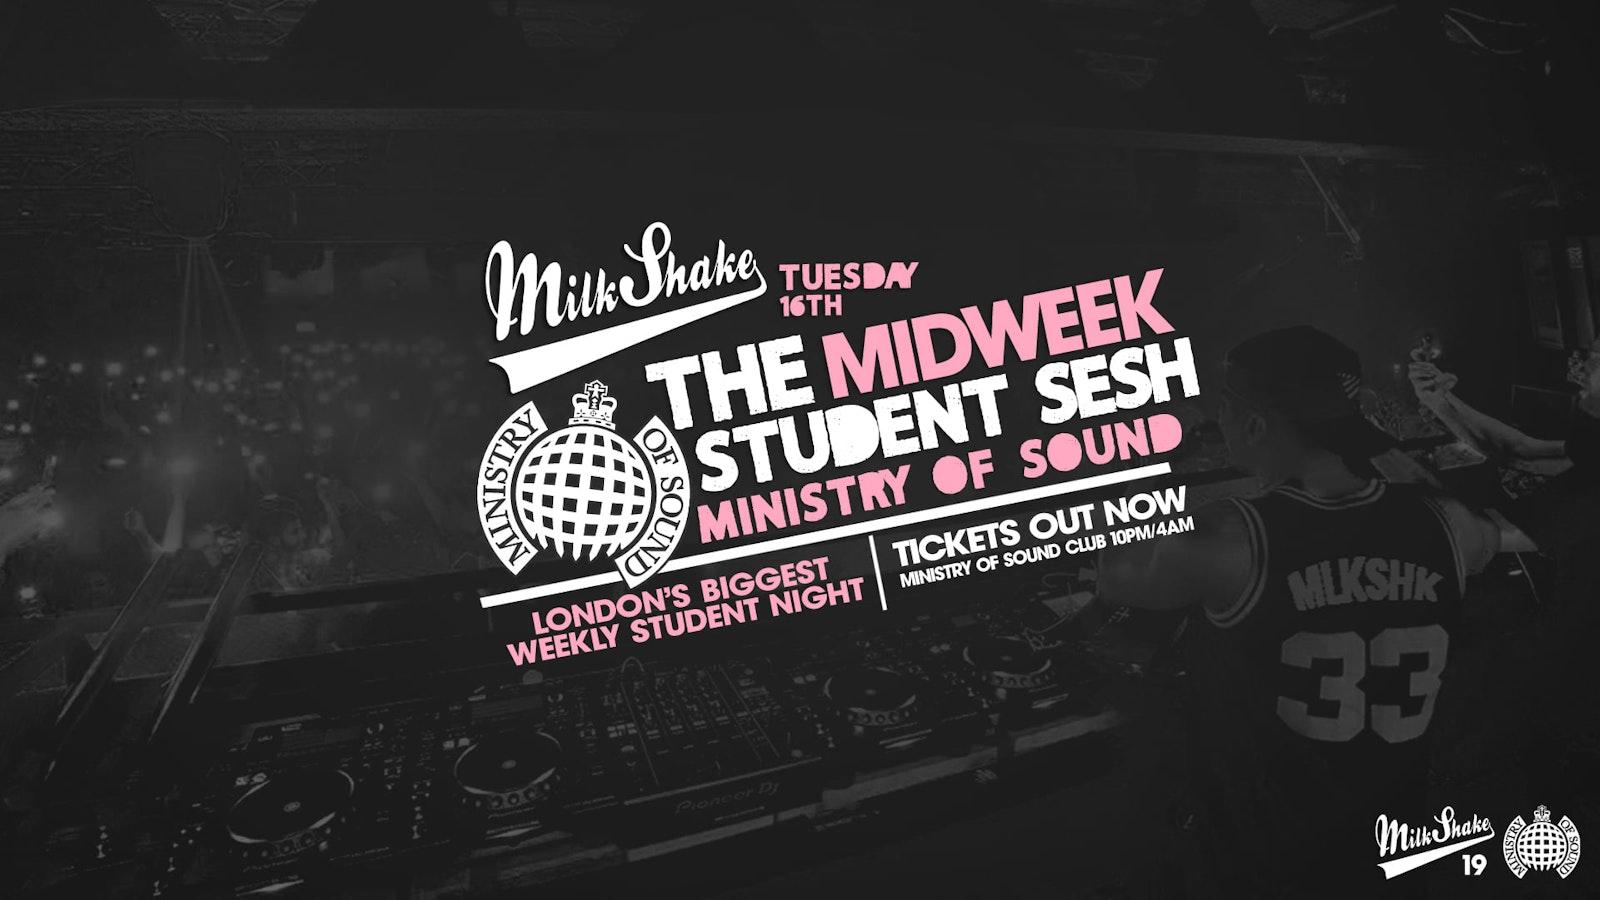 Milkshake, Ministry of Sound | London's Biggest Student Night – November 16th 2021 🔥